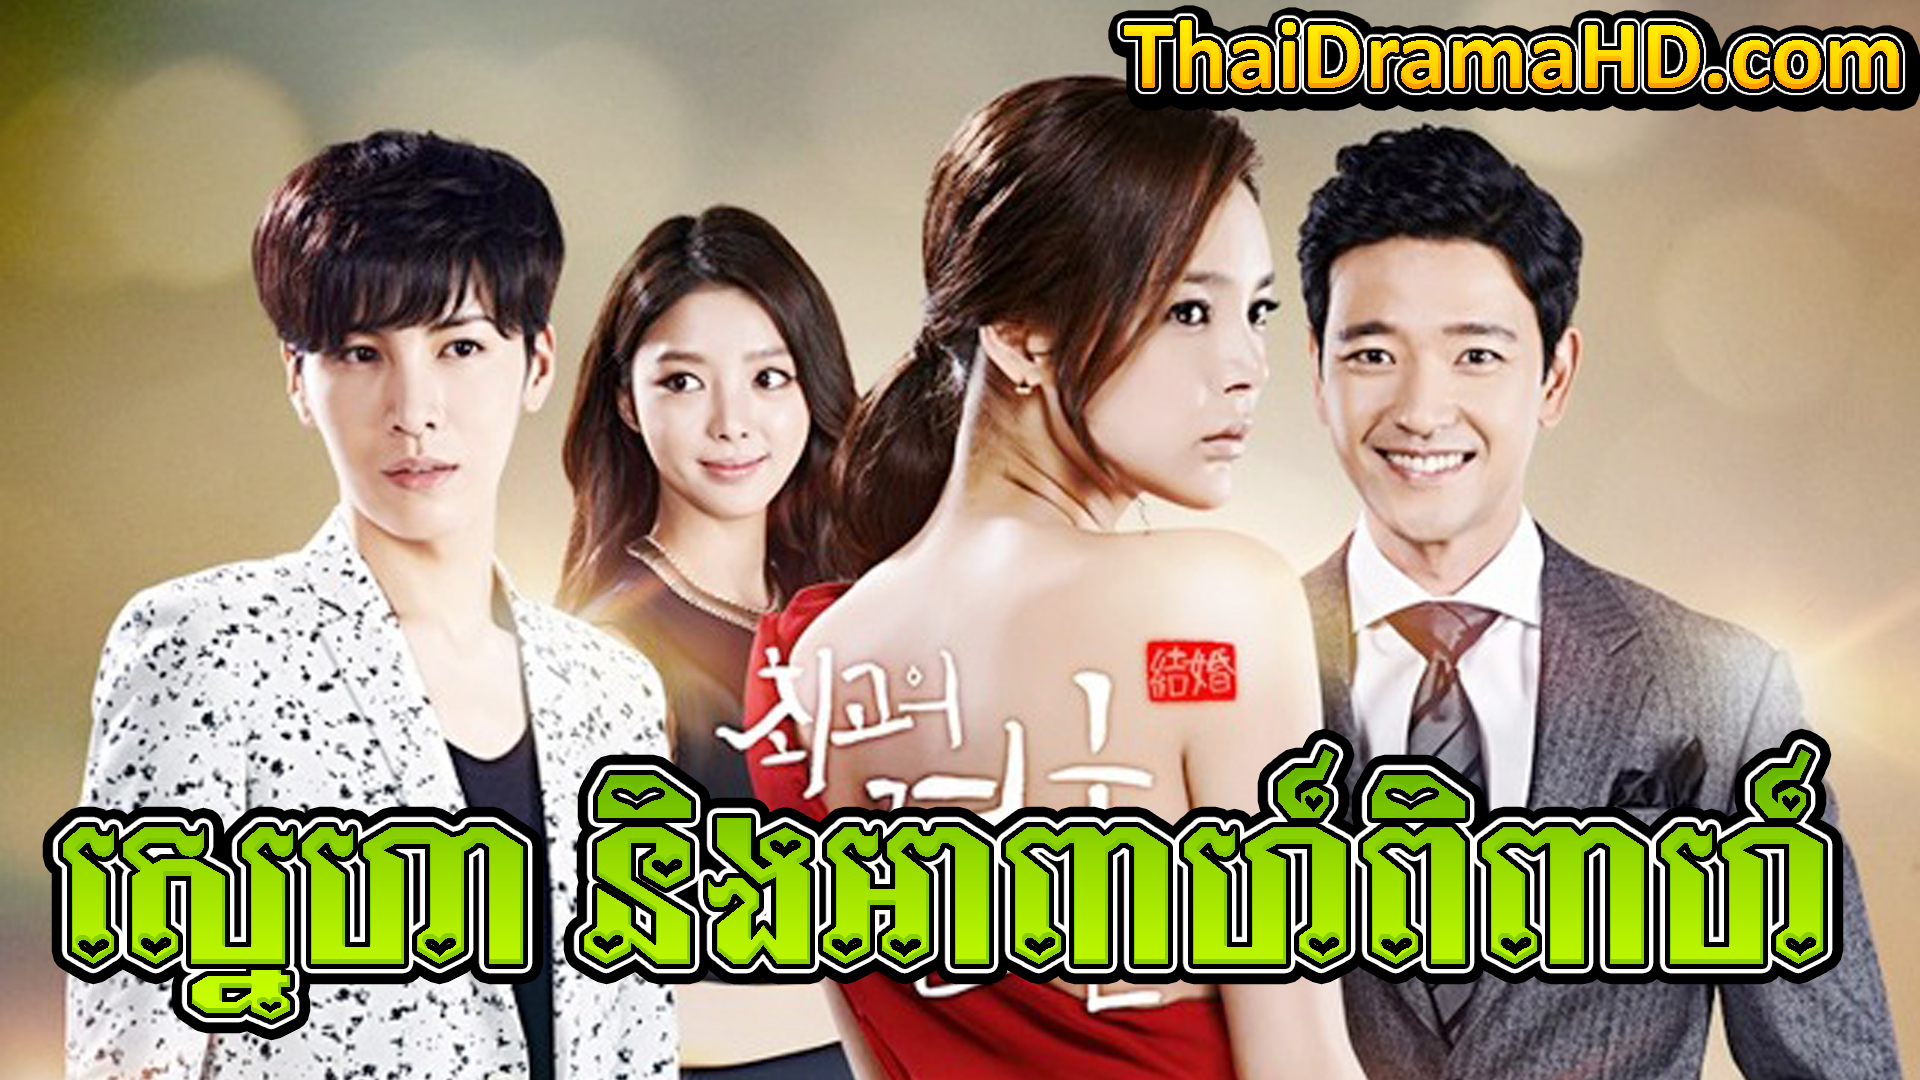 Sneha Noeng Apear Pipeaer | Thai Drama | Khmer Movie | Phumikhmer | movie-khmer | video4khmer | khmotions | kolabkhmer | khmer drama | ksdrama | cookingtips | roscheat | khmertimeskh | khmerkomsan | phumi7 | merlkon | film2us | movie2kh | sweetdrama | khmercitylove | khreplay | tvb cambodia drama | ckh7 | srokthai | phumimedia | phumi8 | khmer avenue | khmer search | Soyo | khmerfans